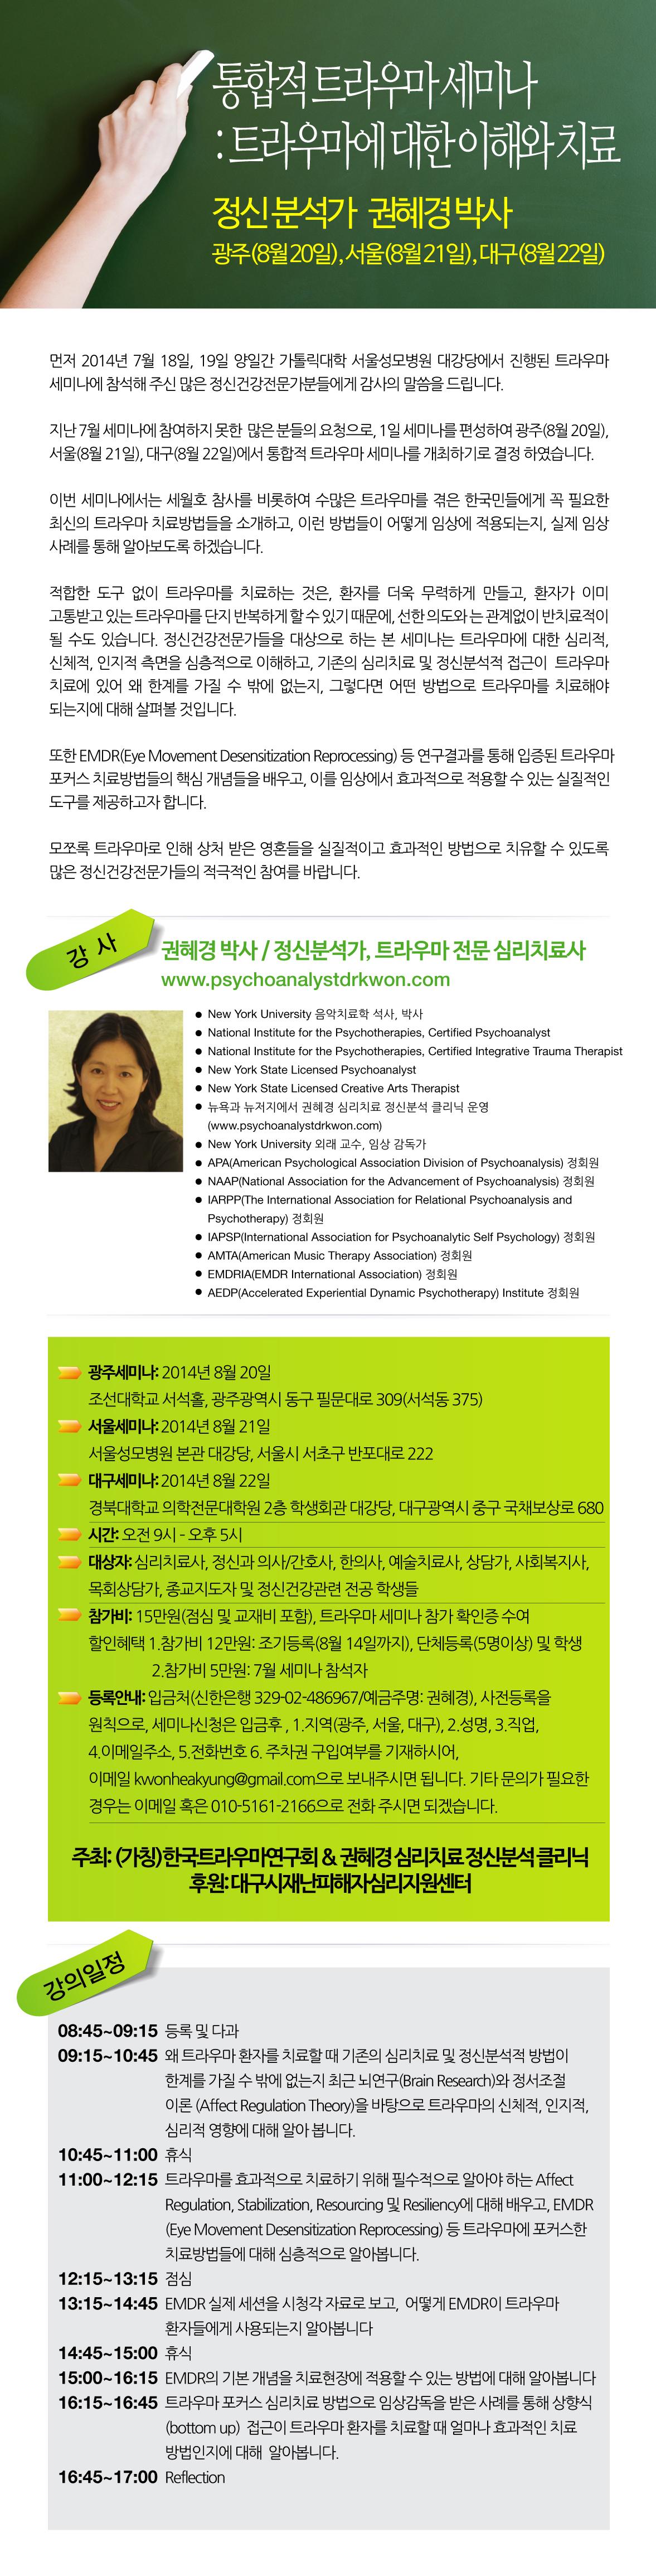 Integrative Trauma Seminar: Psychoanalyst Dr.Kwon Hea-Kyung